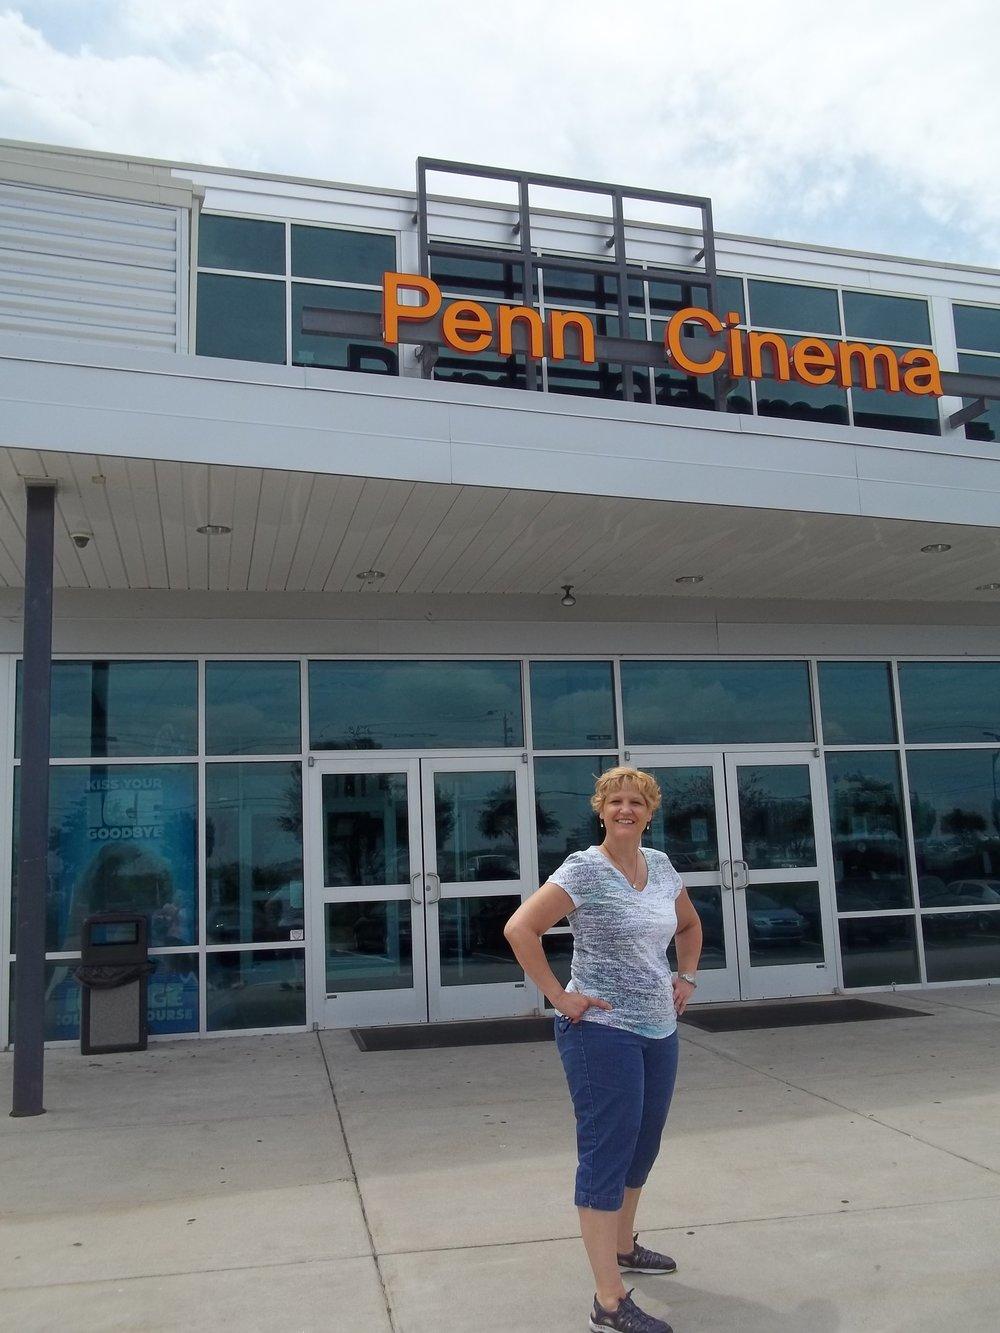 RR at Penn Cinema Entrance.JPG